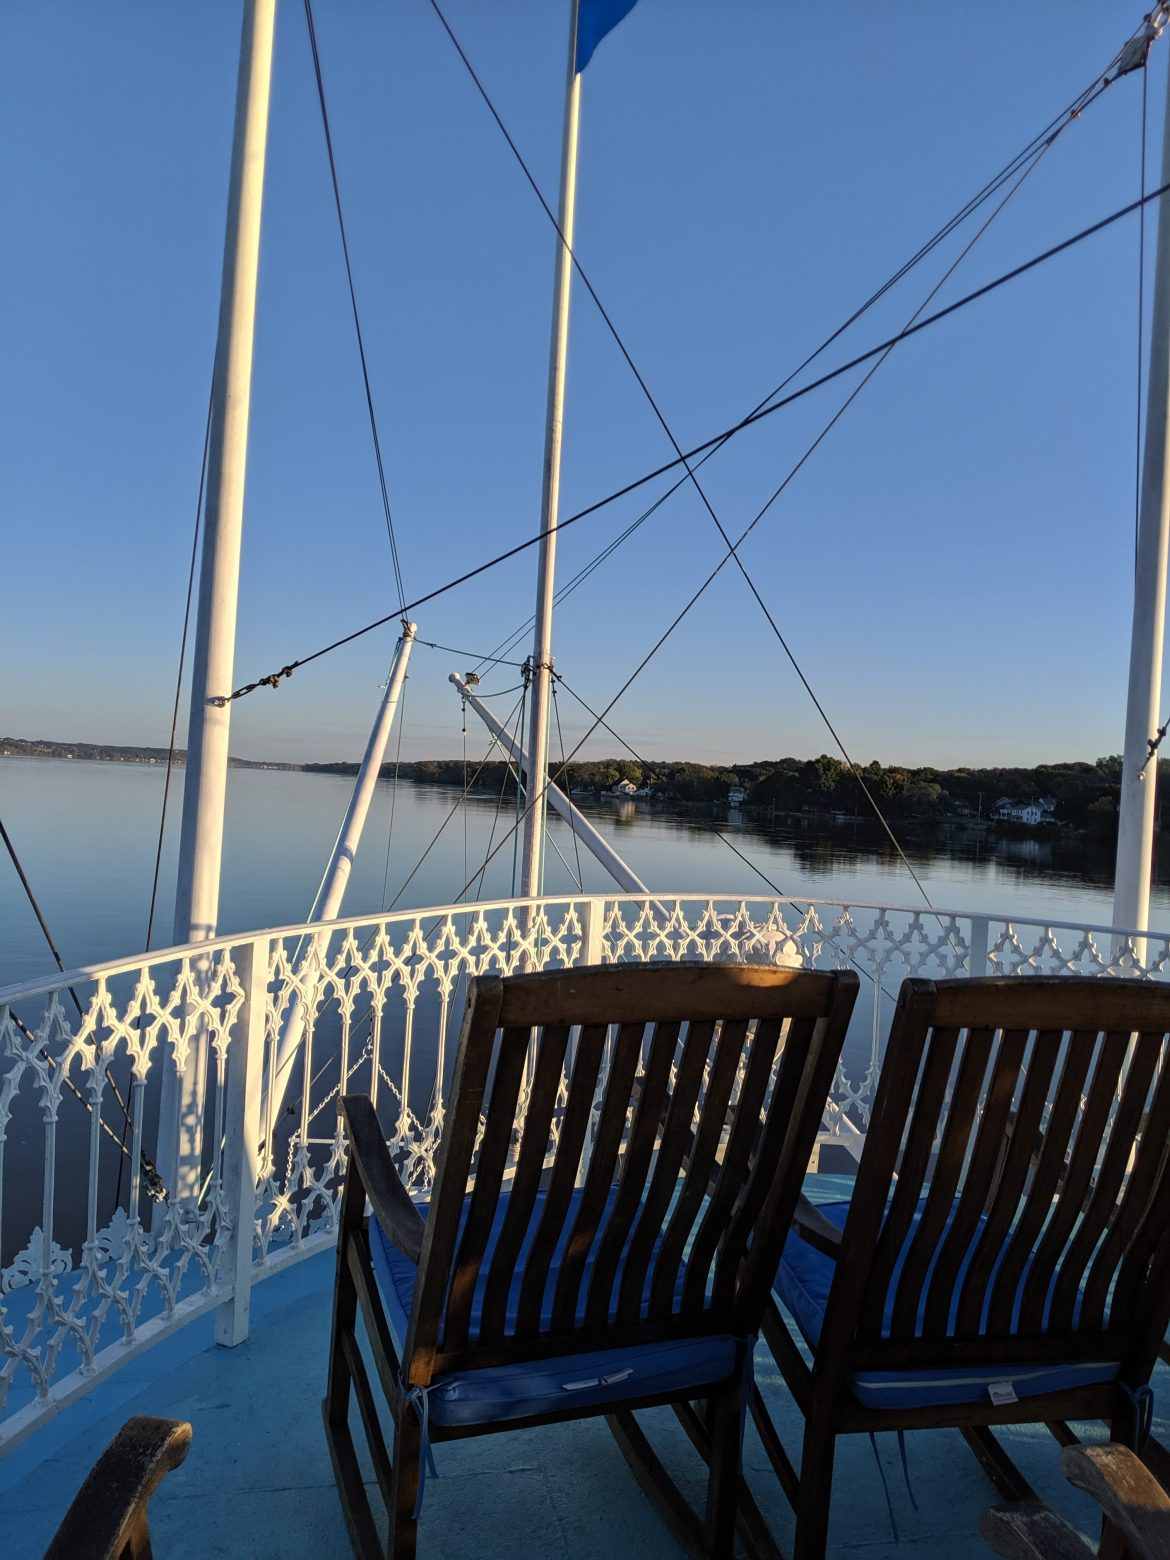 Riverboat CruiseIMG_20191017_075728